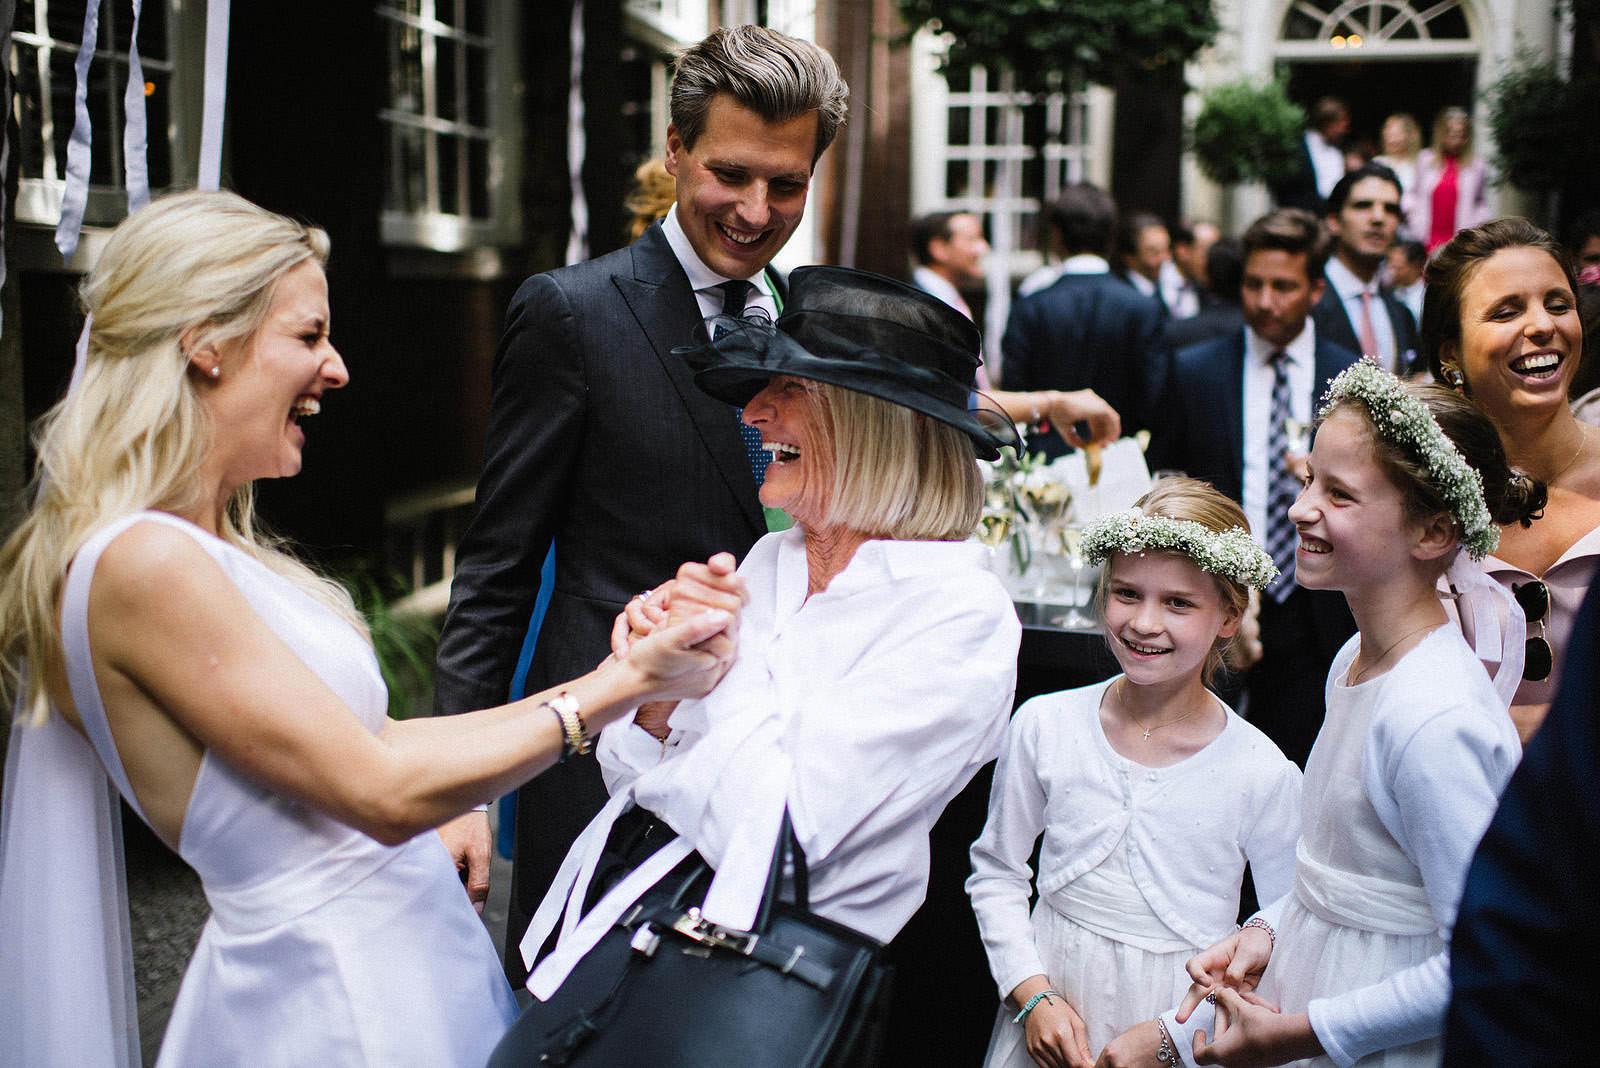 Fotograf Konstanz - Destination Wedding Photographer Amsterdam 069 - Destination Wedding Amsterdam  - 179 -